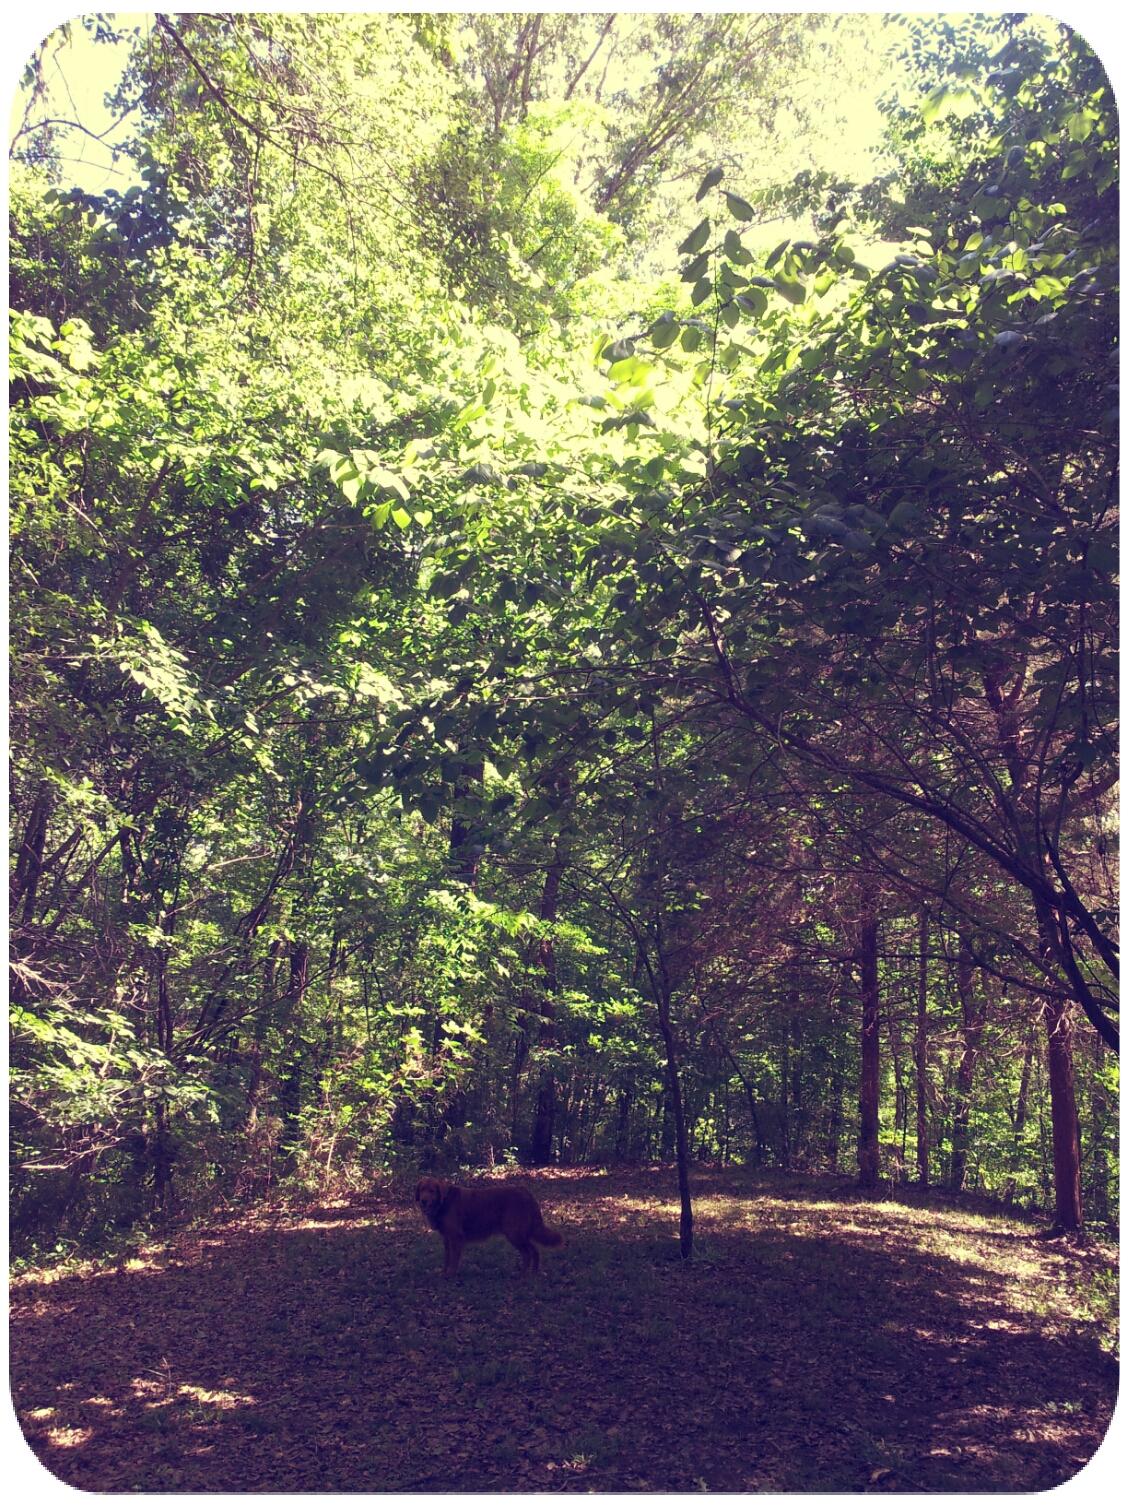 2012-04-23 15.10.18_Roxy_Round.jpg